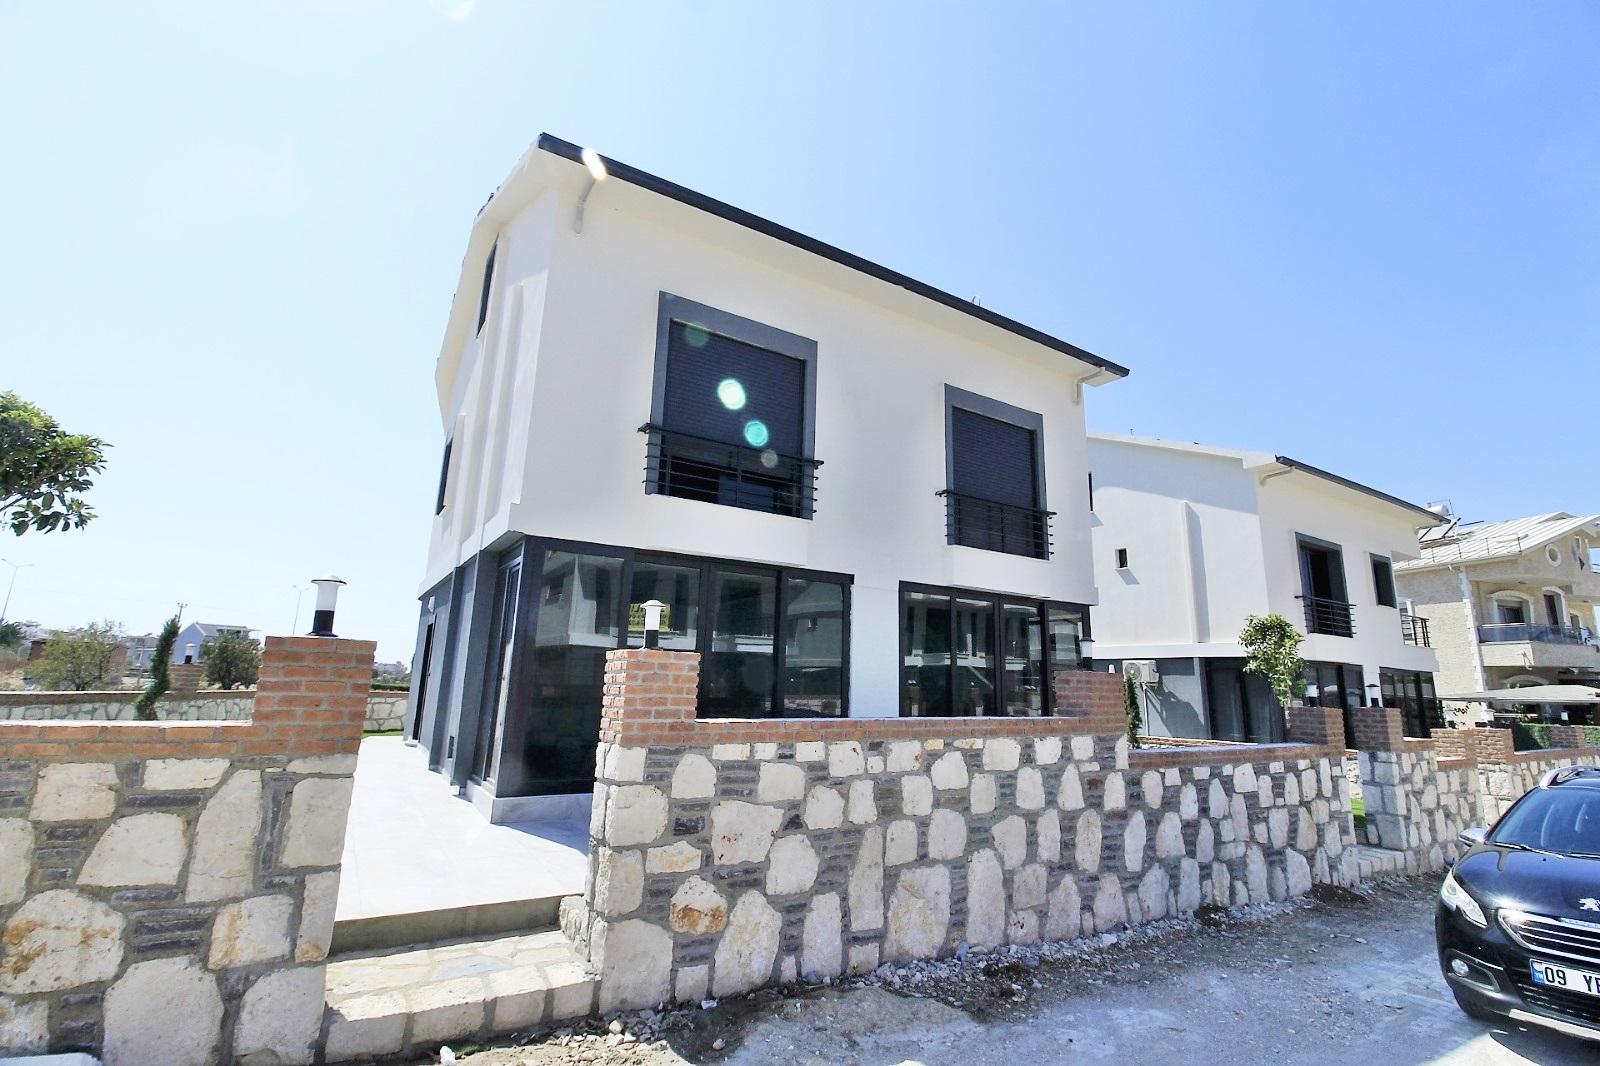 Bargain Villa For Sale in Didim Turkey – Affordable 2nd Home in Turkey